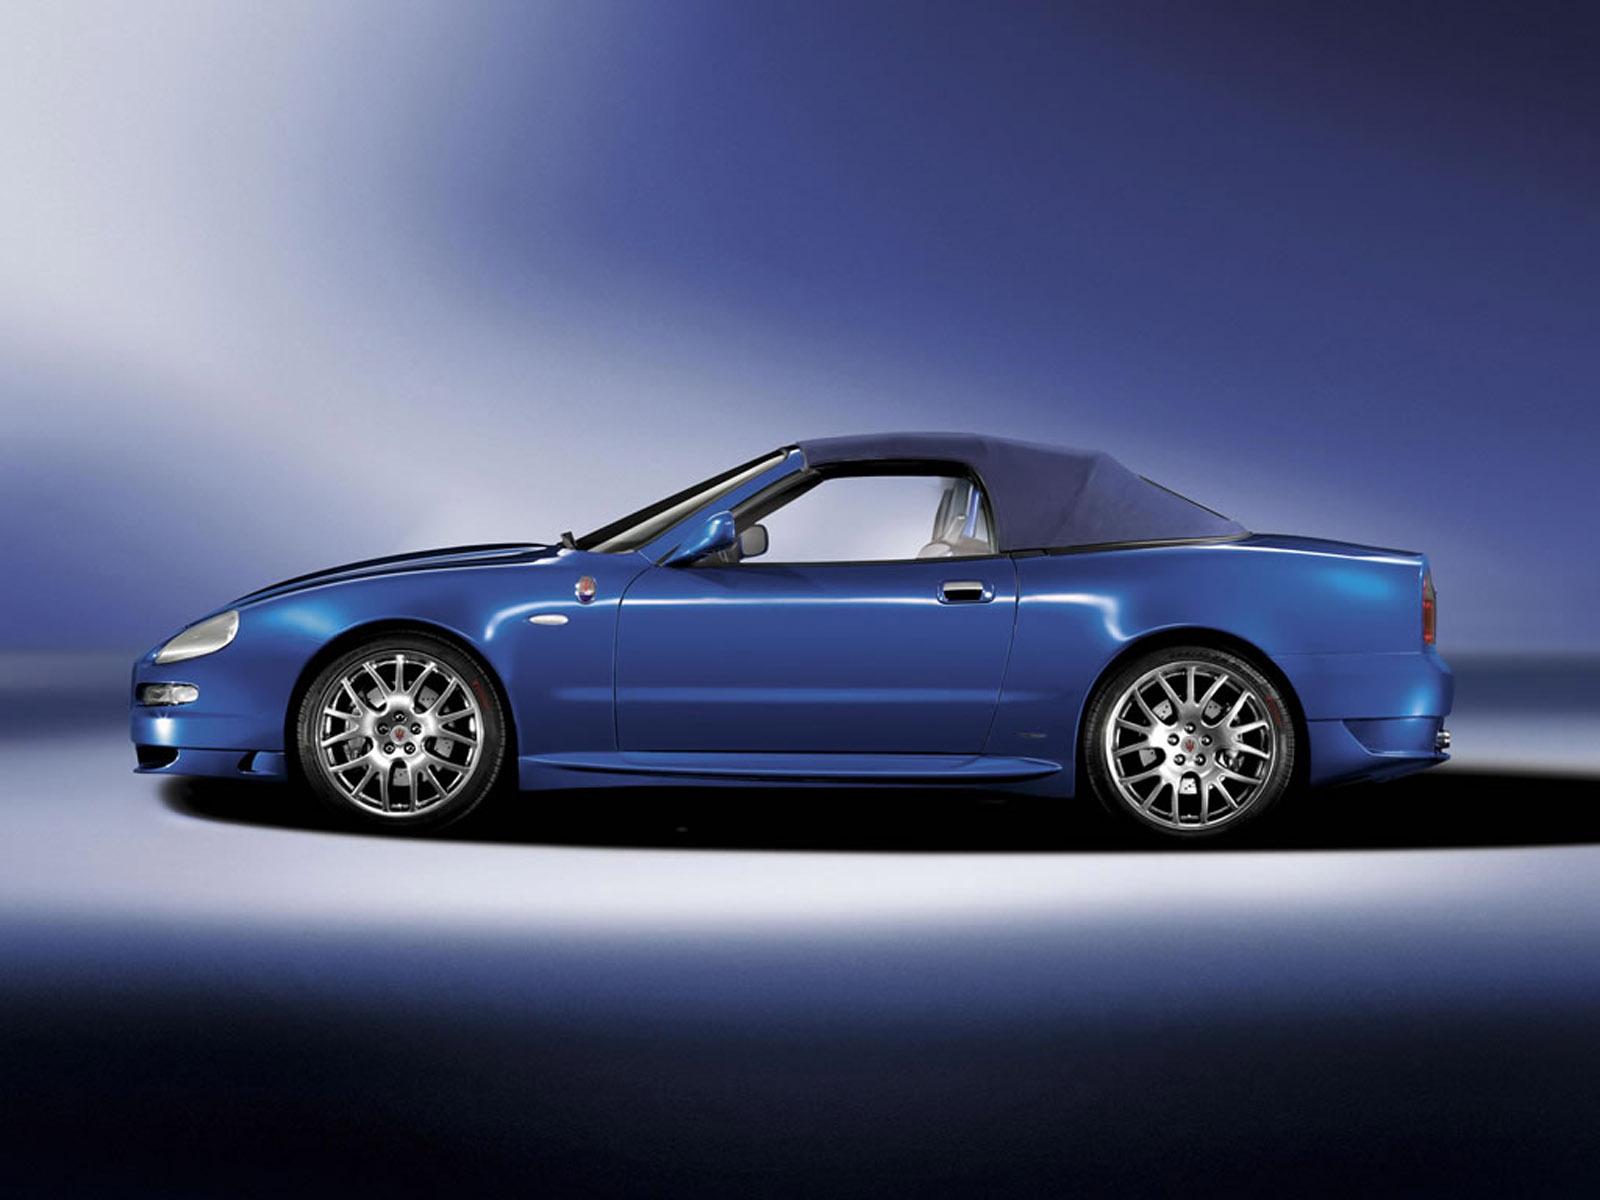 https://www.automobilesreview.com/img/2004-maserati-spyder-90th-anniversary/2004-maserati-spyder-90th-anniversary-03.jpg